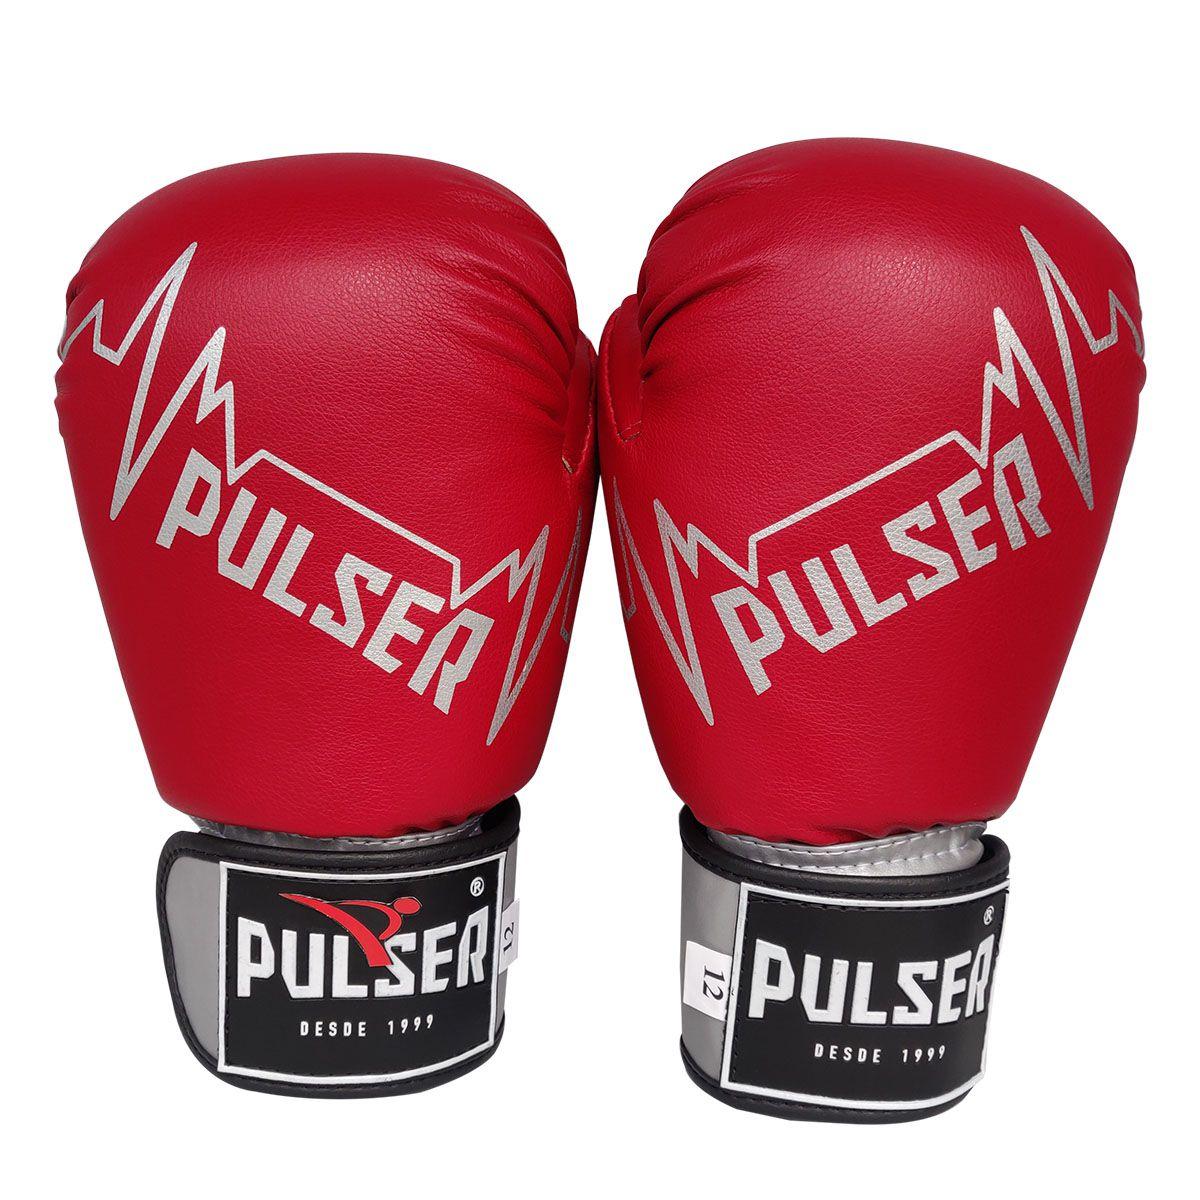 Kit de Boxe / Muay Thai 10oz - Vermelho Pulser Logo - Pulser  - PRALUTA SHOP